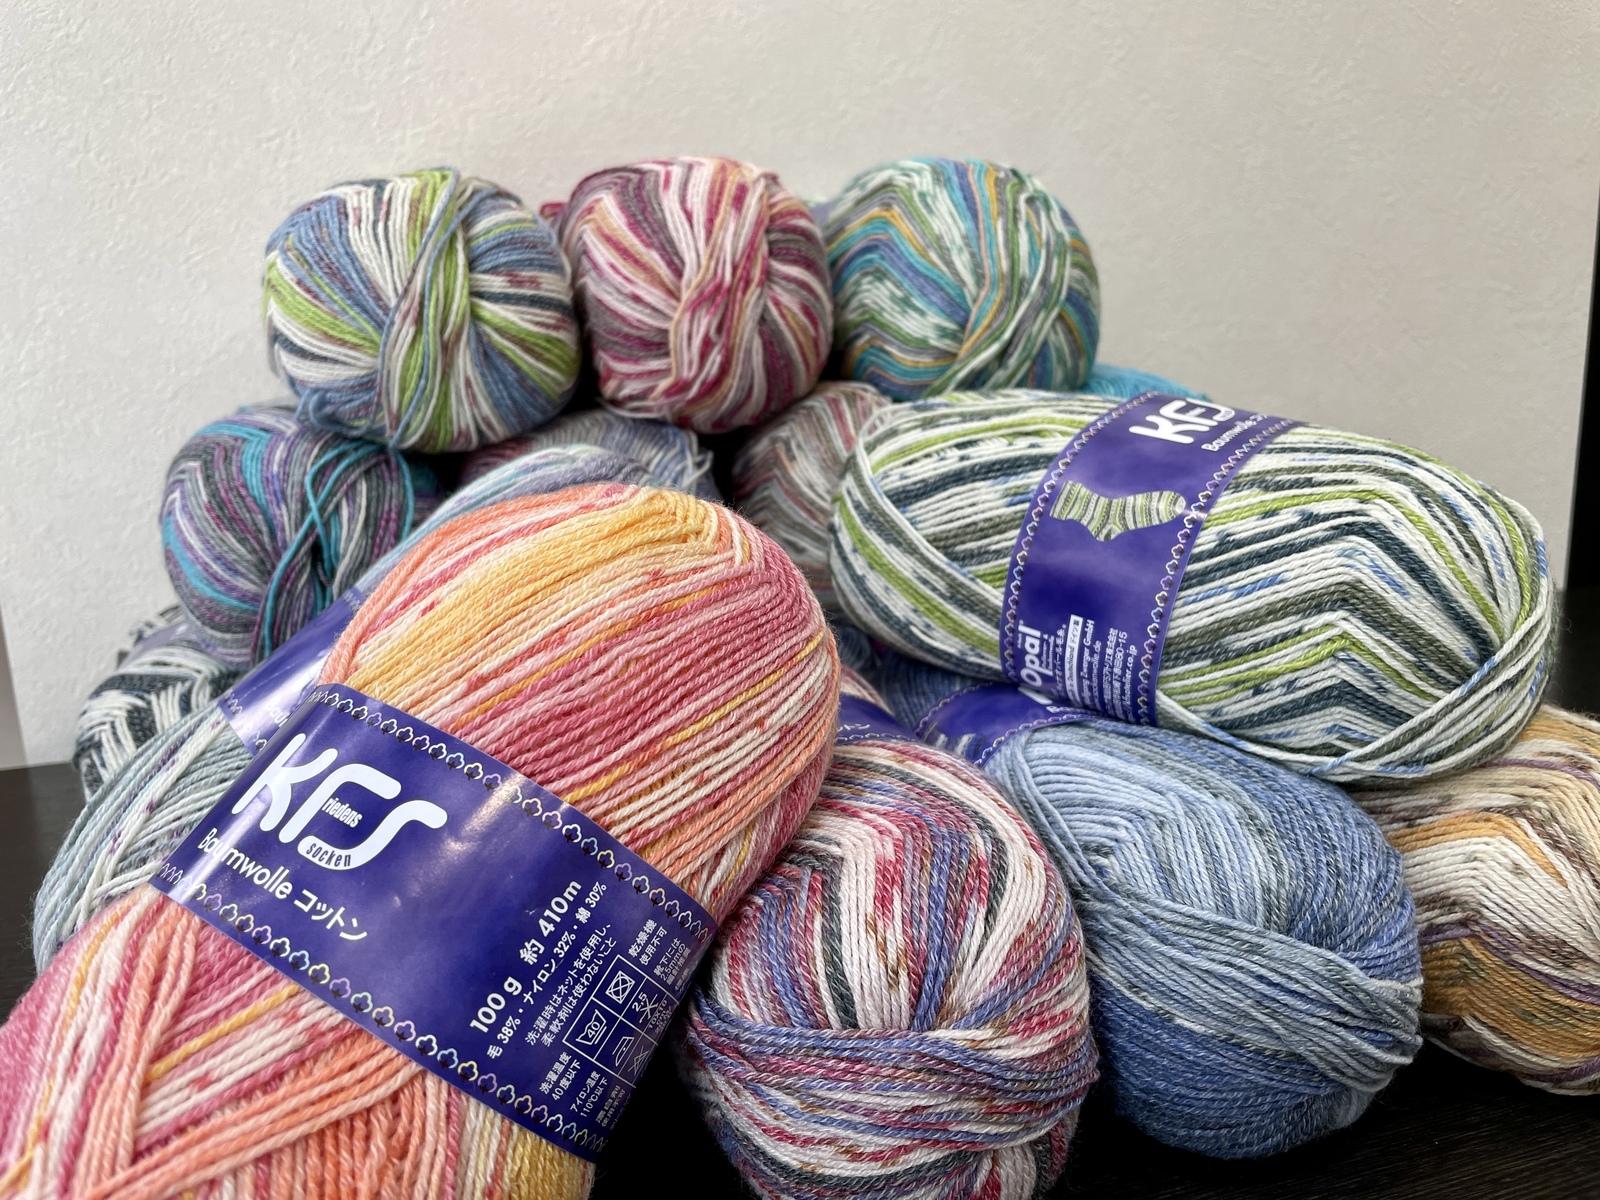 KFSオリジナルのコットン毛糸単純な編み方で可愛い柄が編める毛糸 opal毛糸 KFSコットン